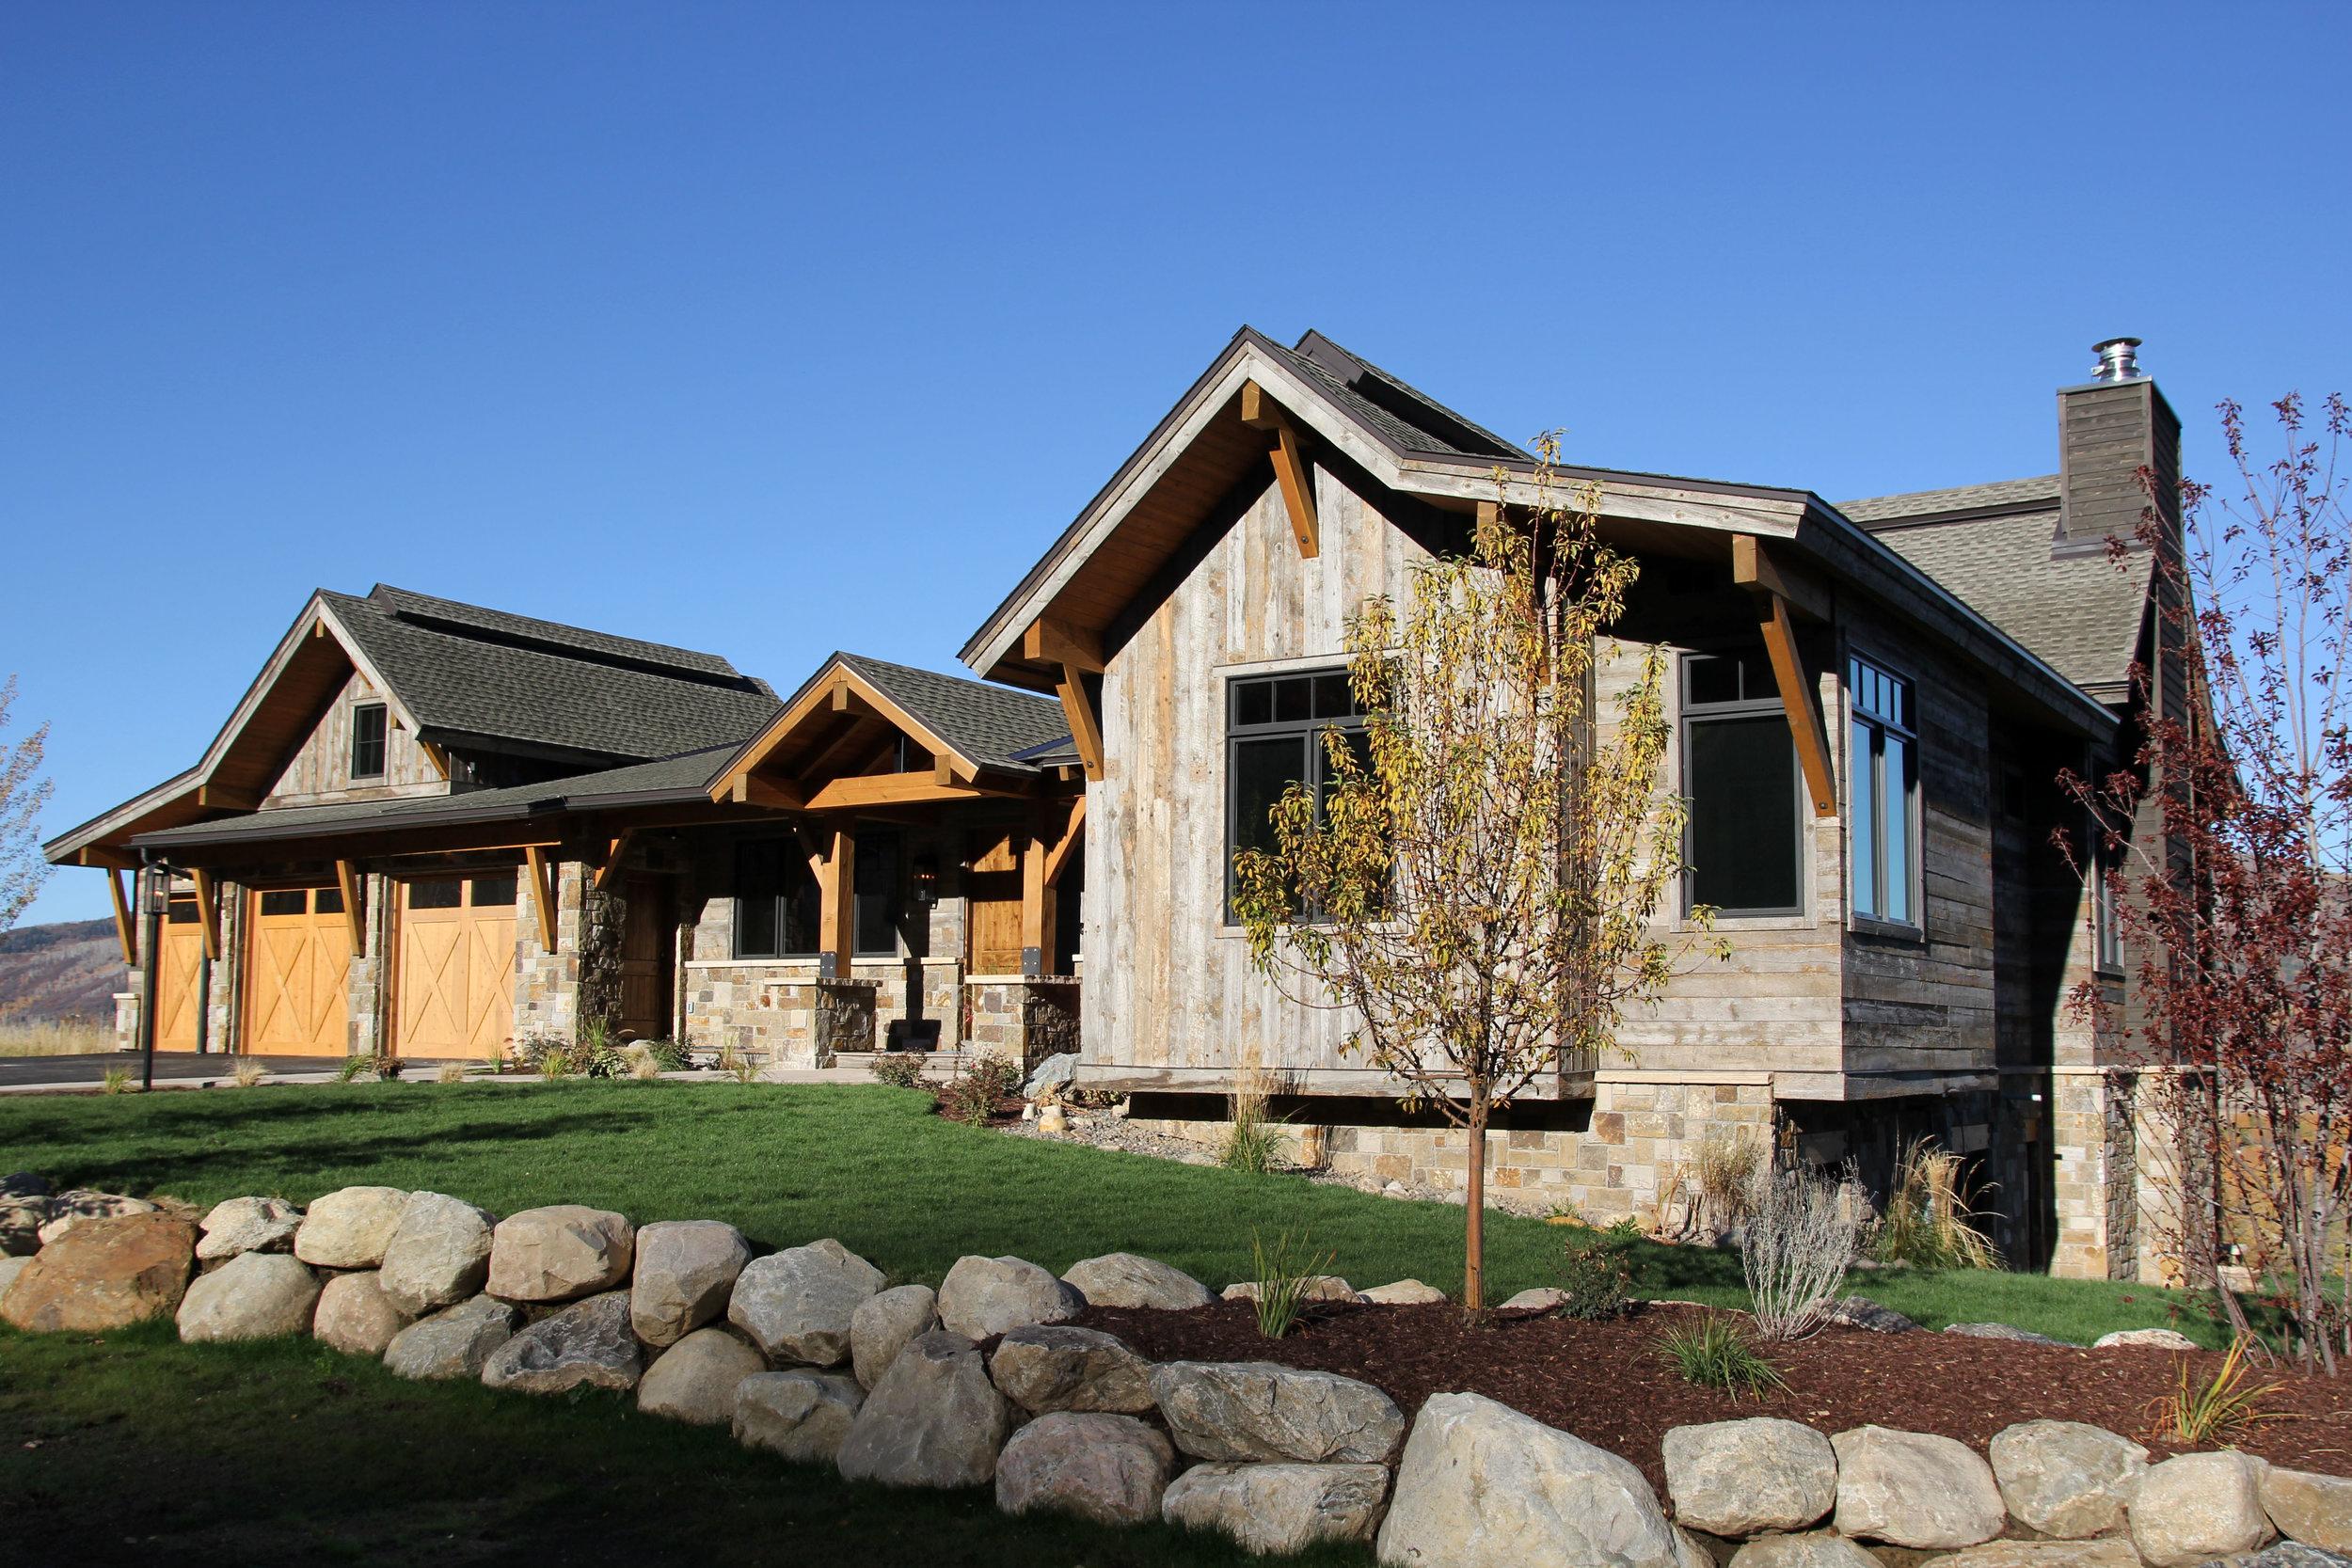 Colorado Residential Architect Sudol 6.jpg